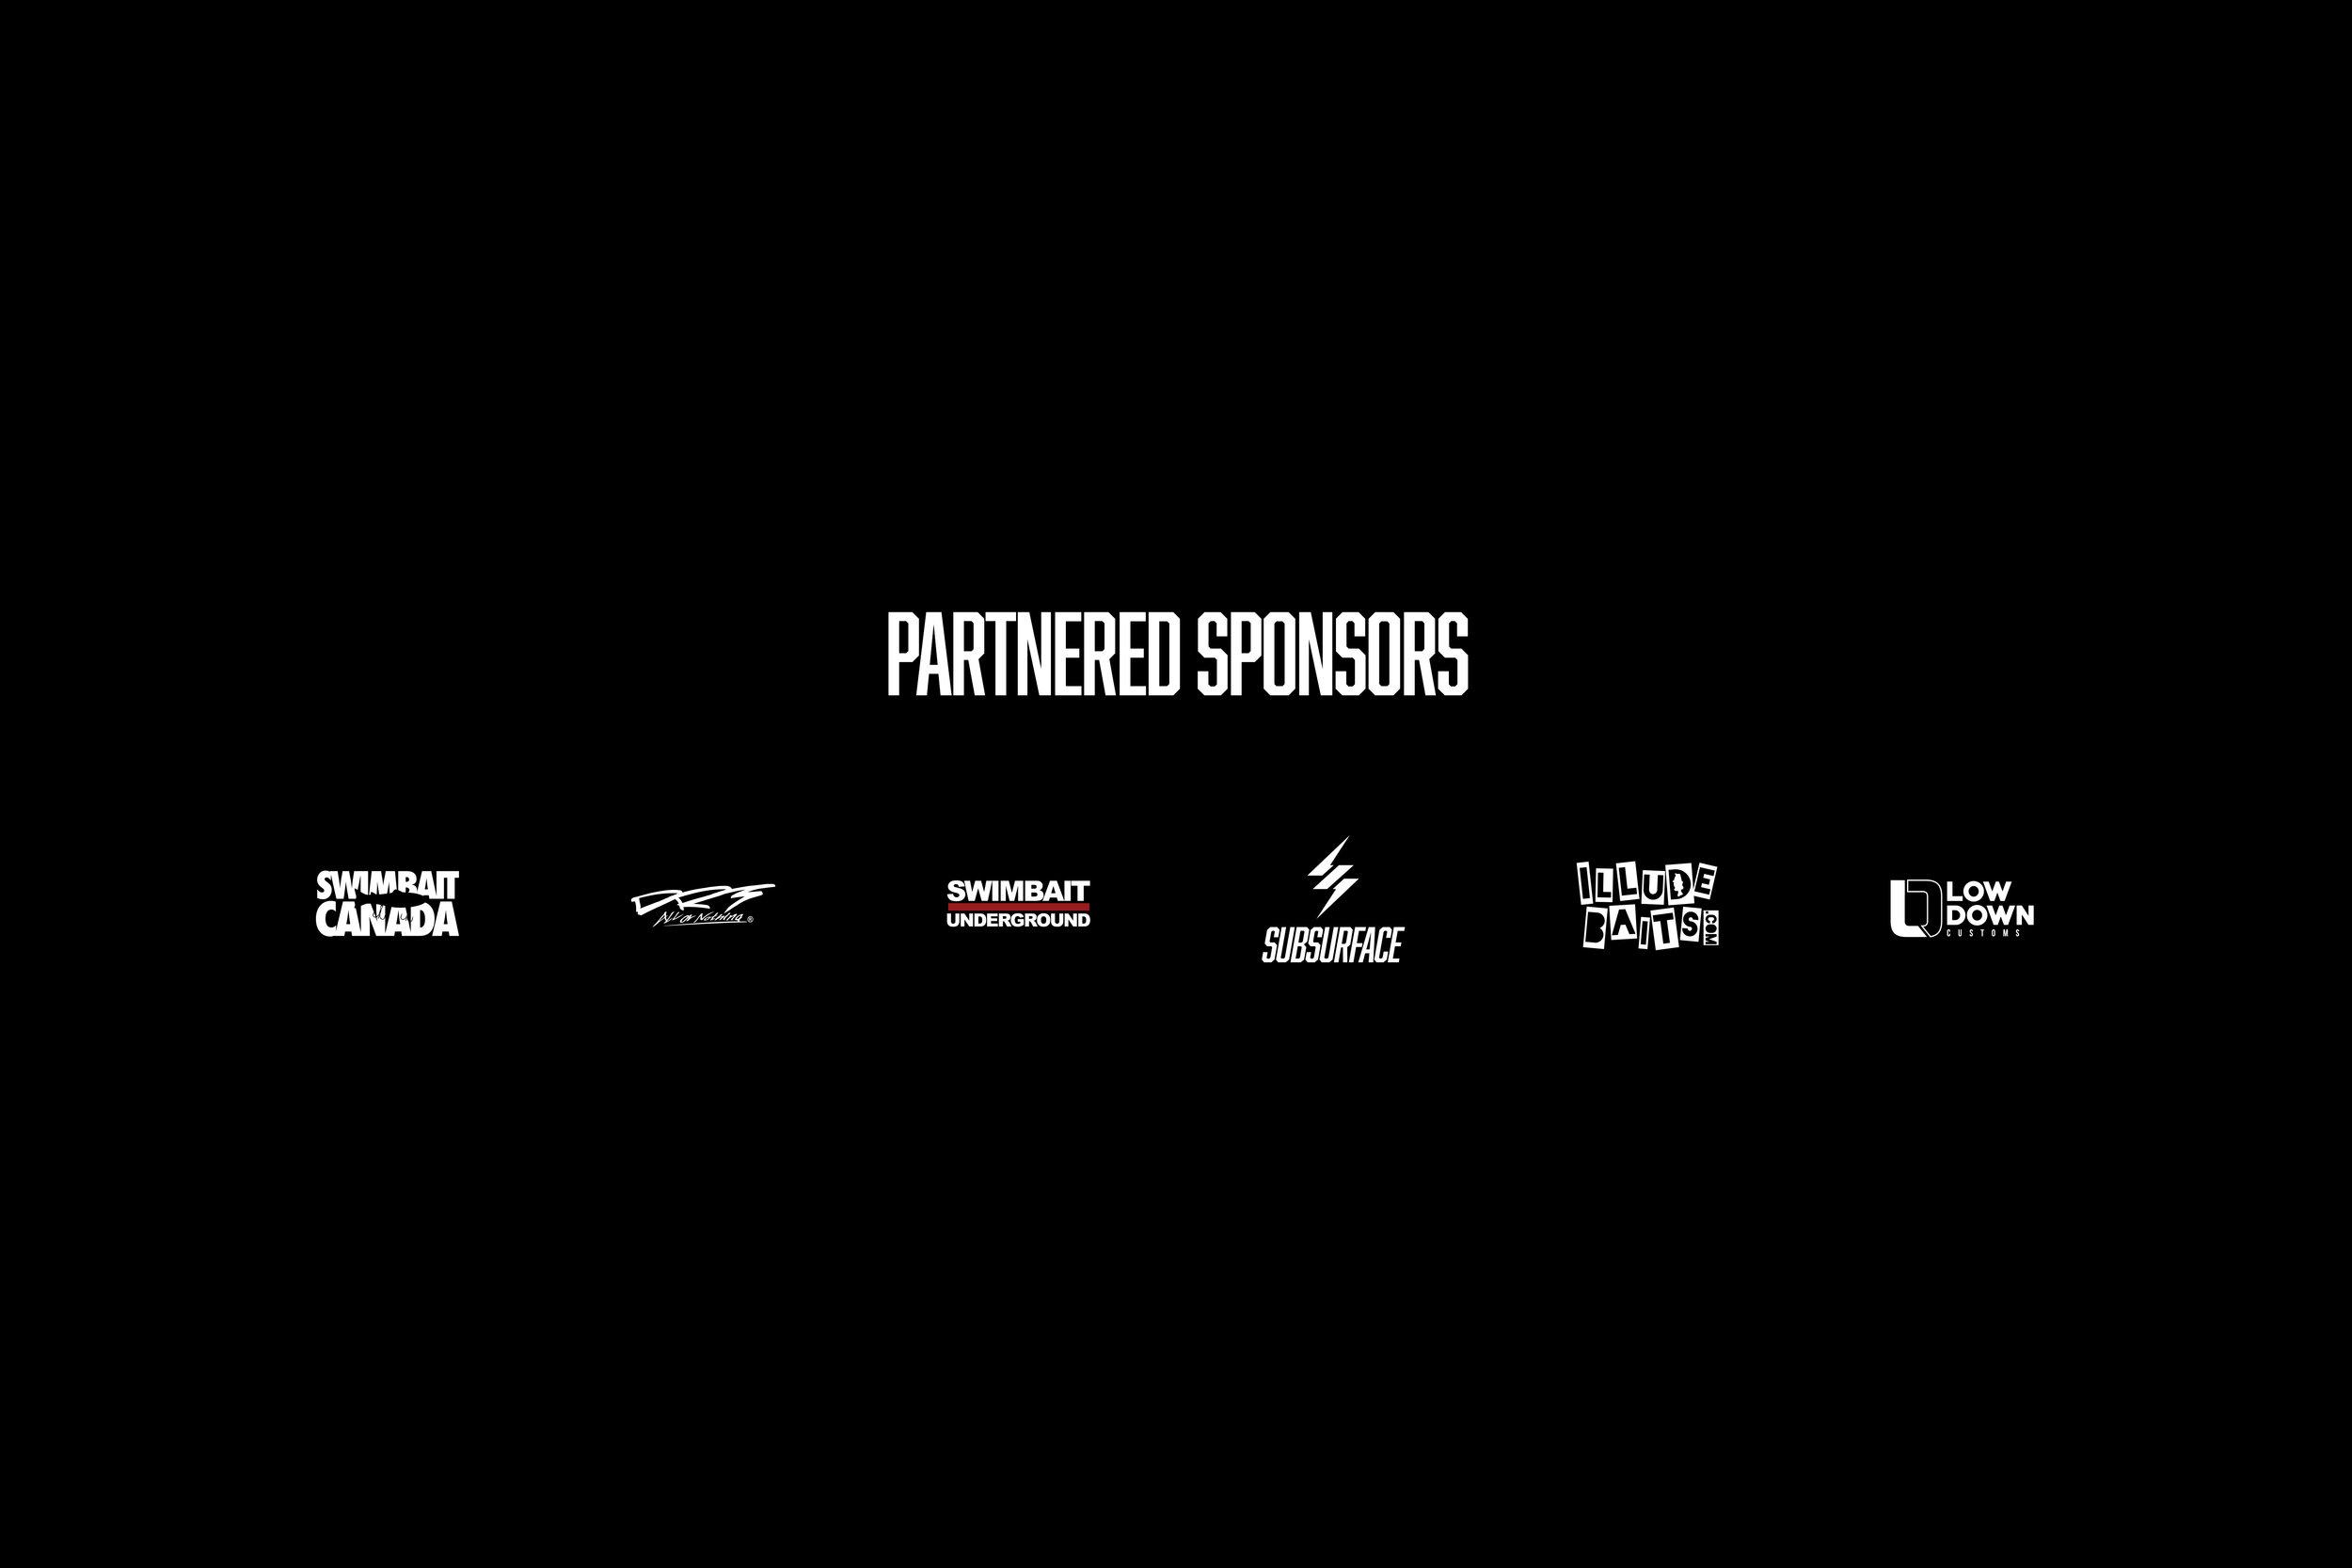 Follow the Partnered Sponsors on Instagram:  @swimbaitcanada ,  @drt_usa ,  @drtheadz ,  @swimbaitunderground ,  @sbsrfc ,  @illudebaits ,  @lowdowncustomrods .